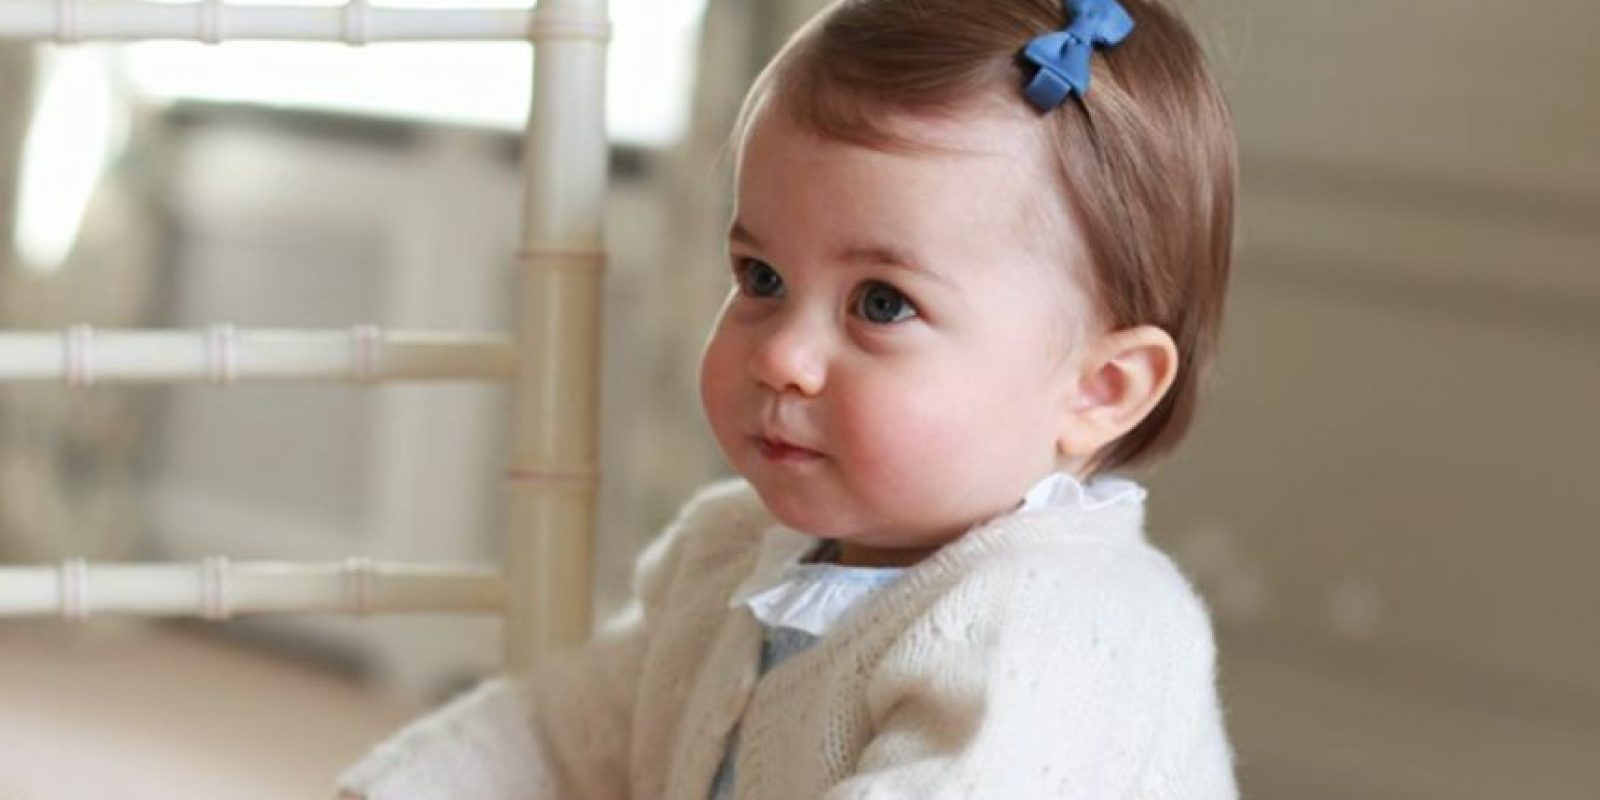 Esto, en fotografías de Annie Leibovitz. Foto:vía Facebook/The Royal Family. Imagen Por: